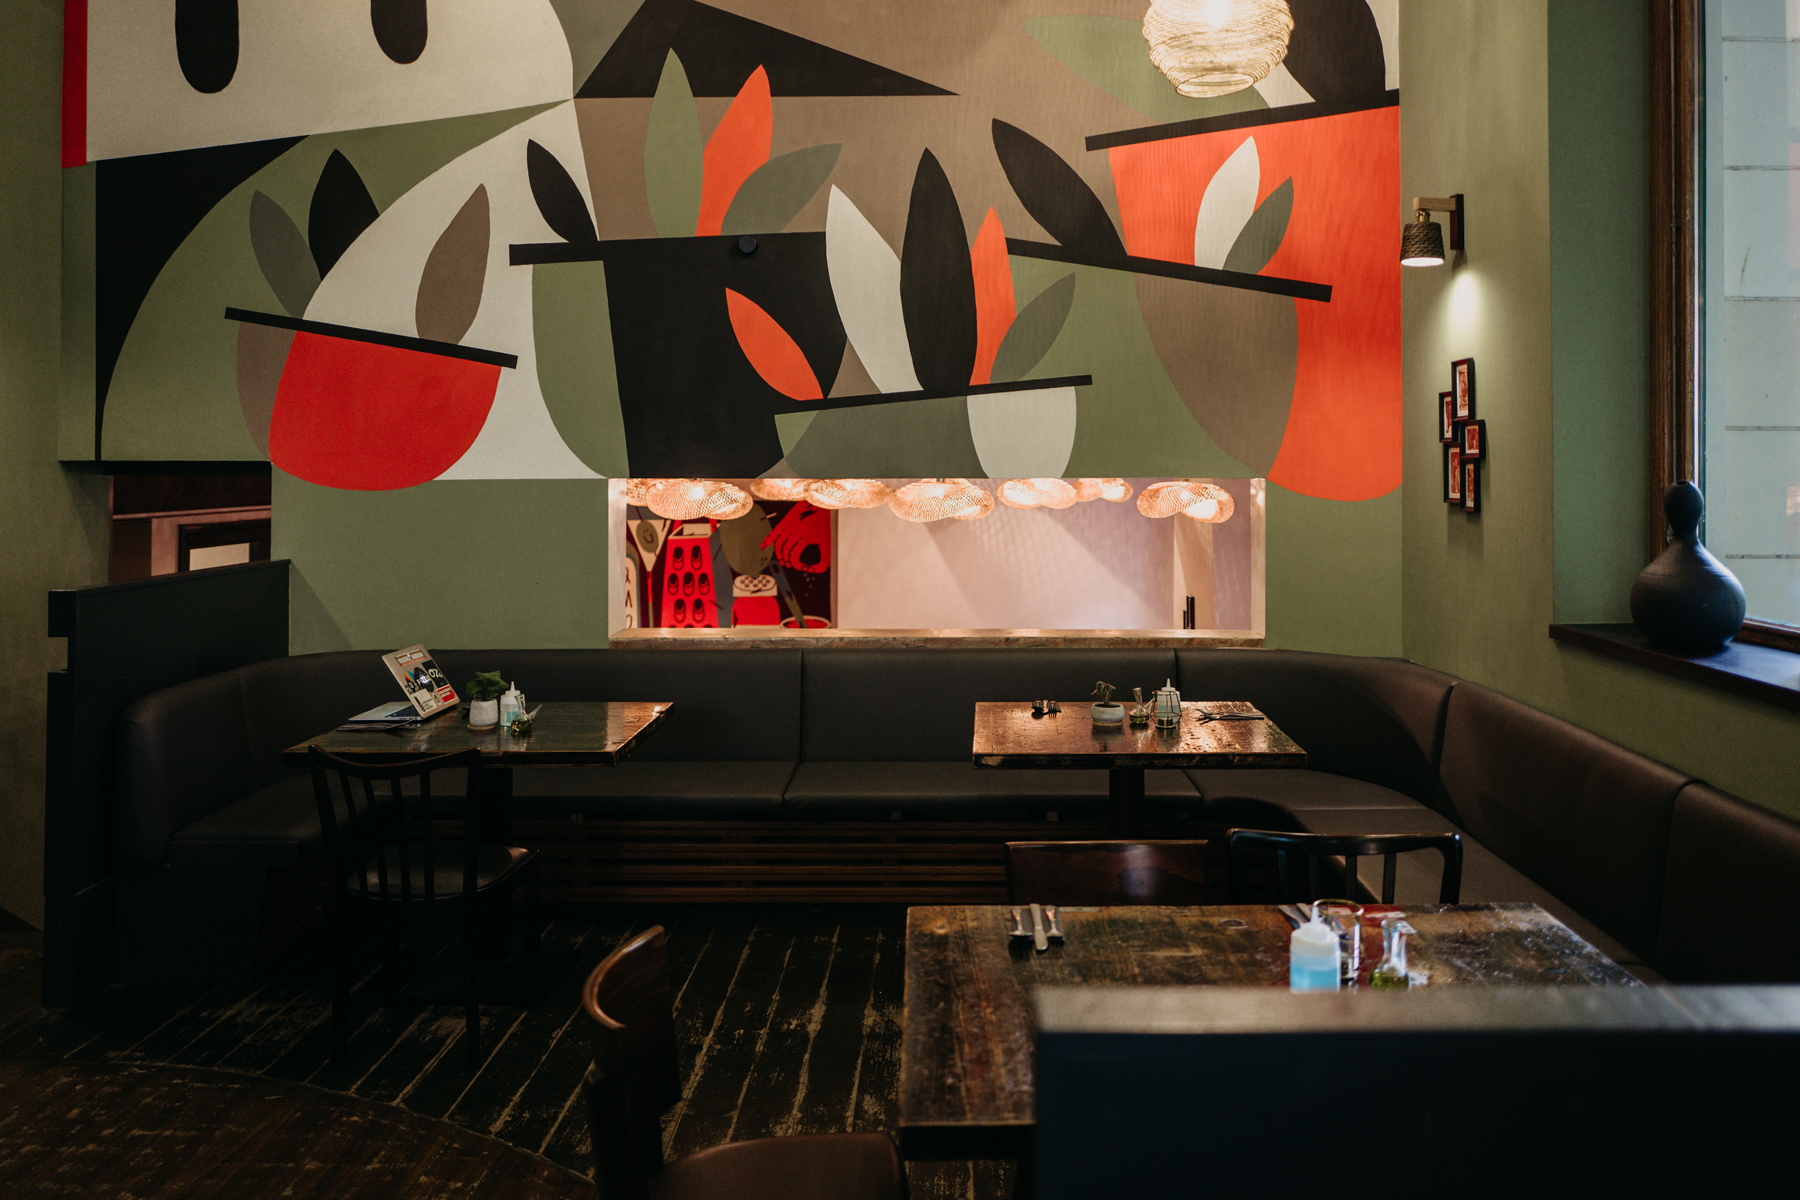 Geheimtipp Hamburg St Pauli Restaurant Maa' Deyo Dahlina Sophie Kock 18